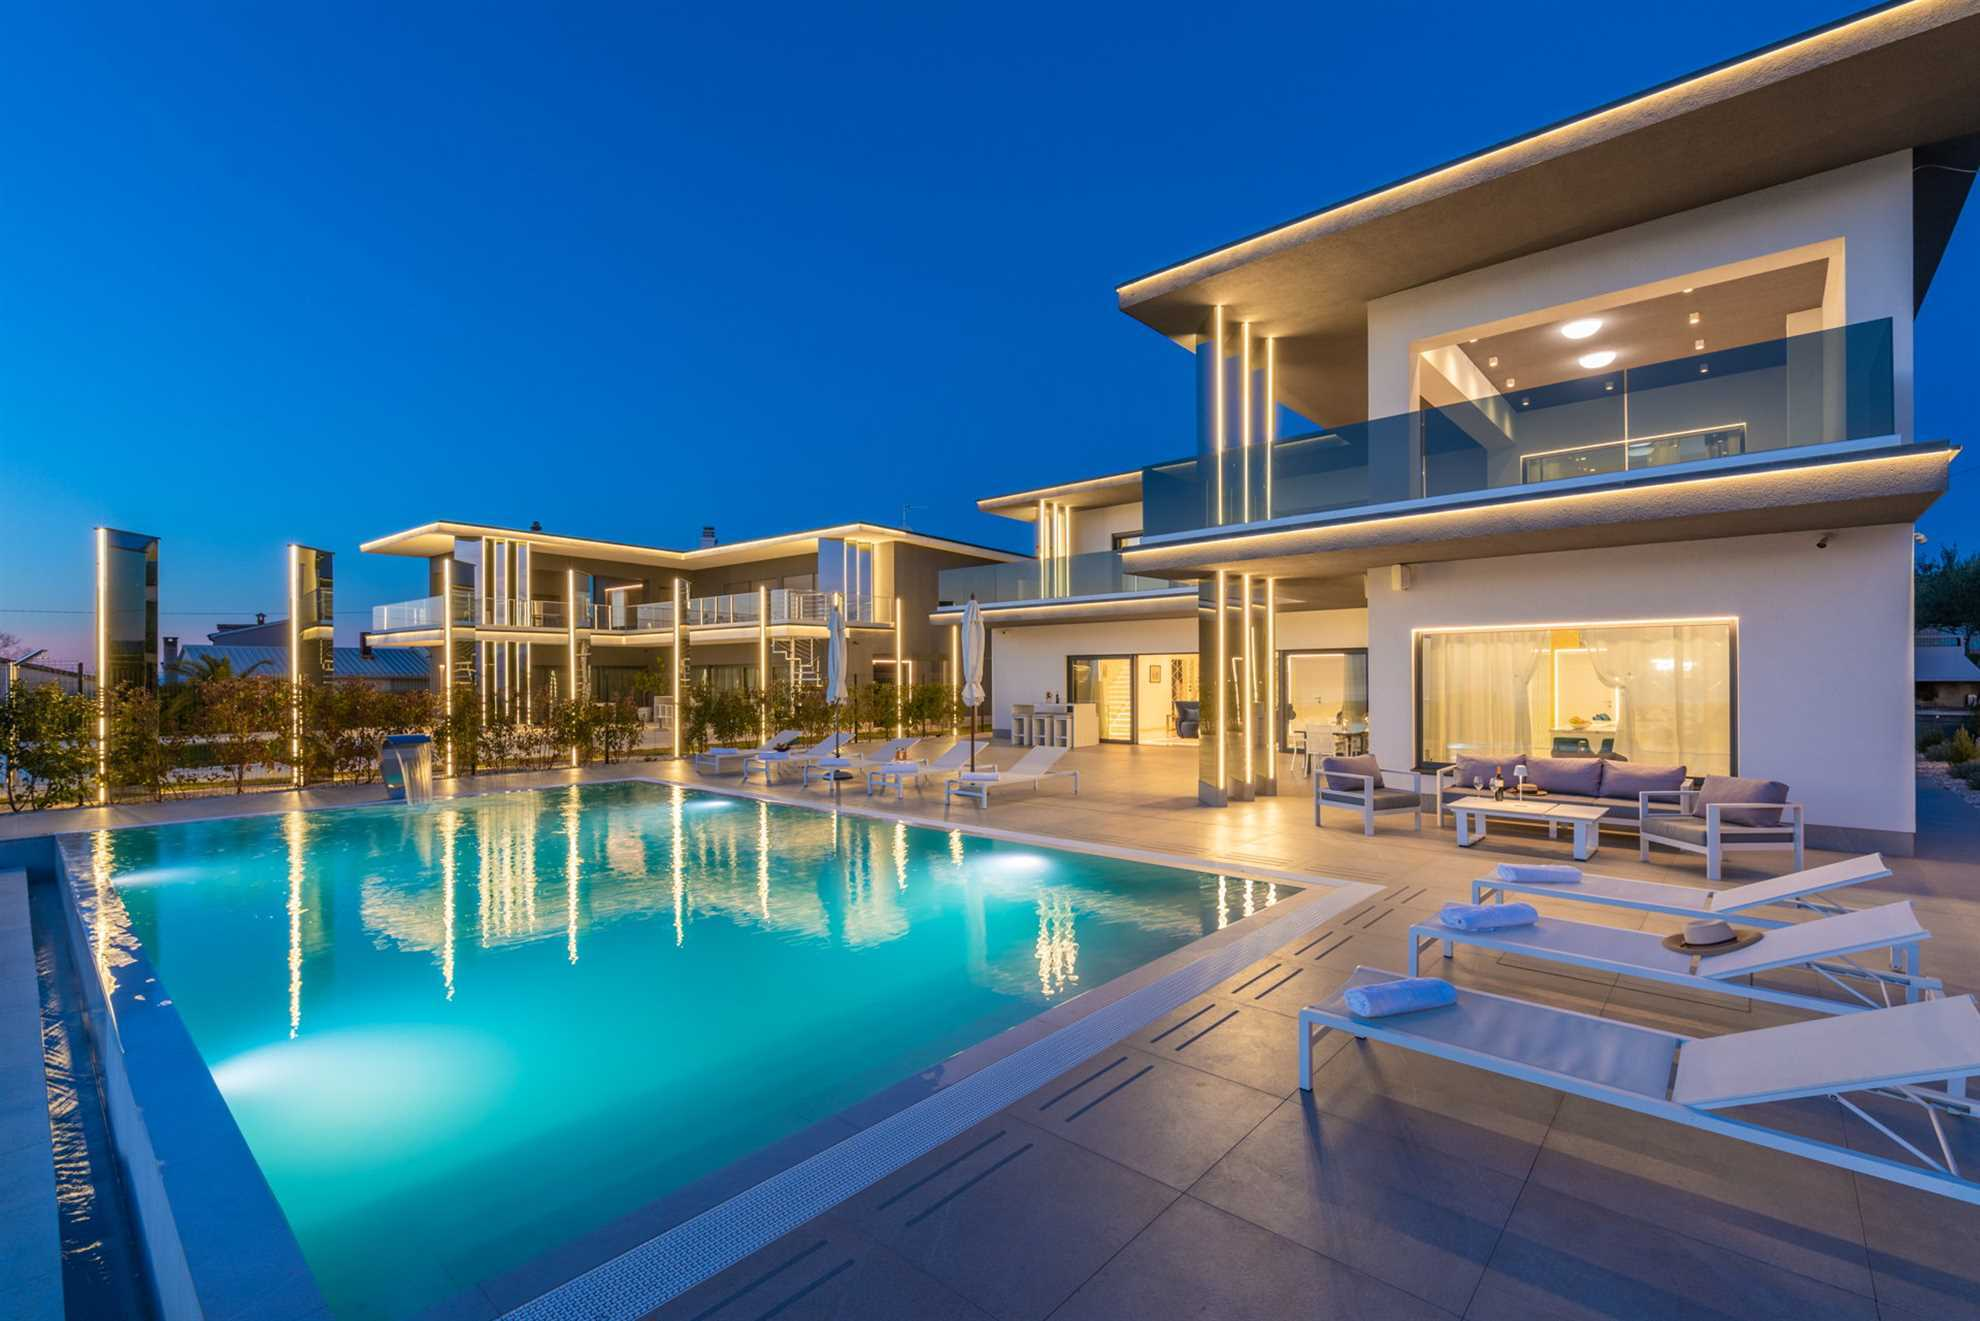 Luxury Villa Aurum with pool for rent in Istria, Croatia